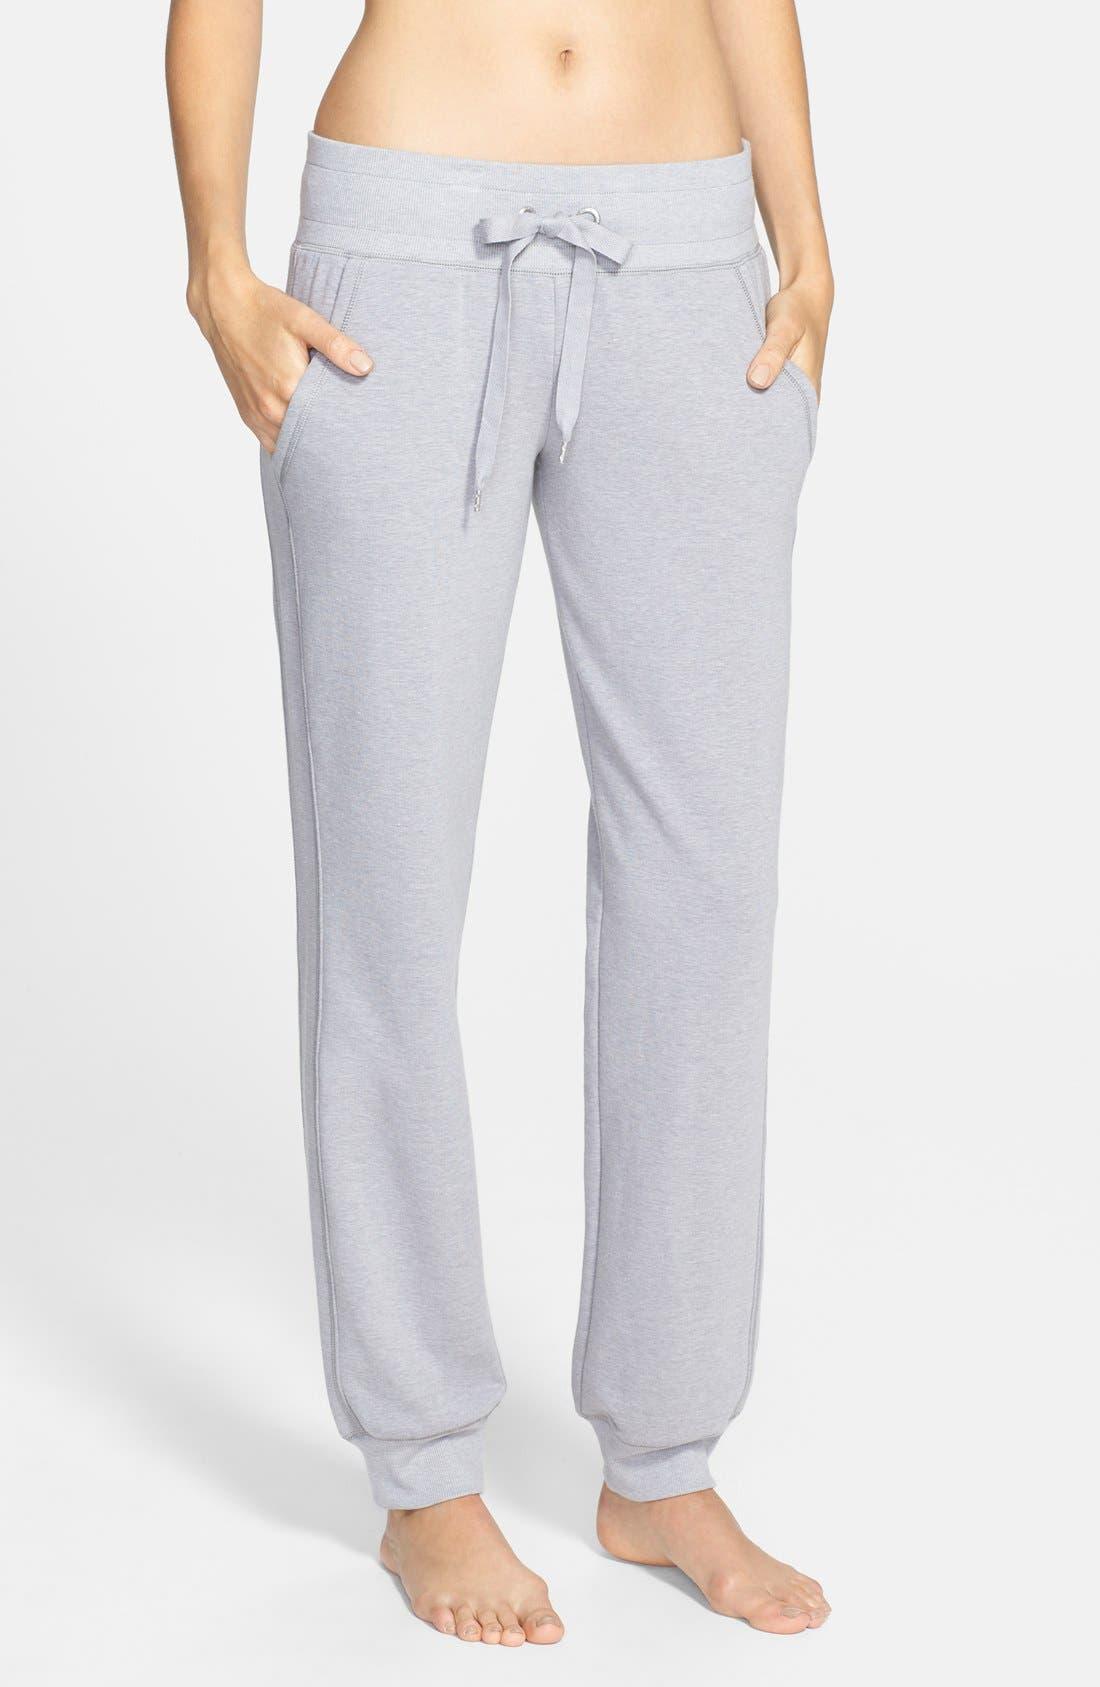 Alternate Image 1 Selected - Zella Low Rise Skinny Fleece Sweatpants (Online Only)